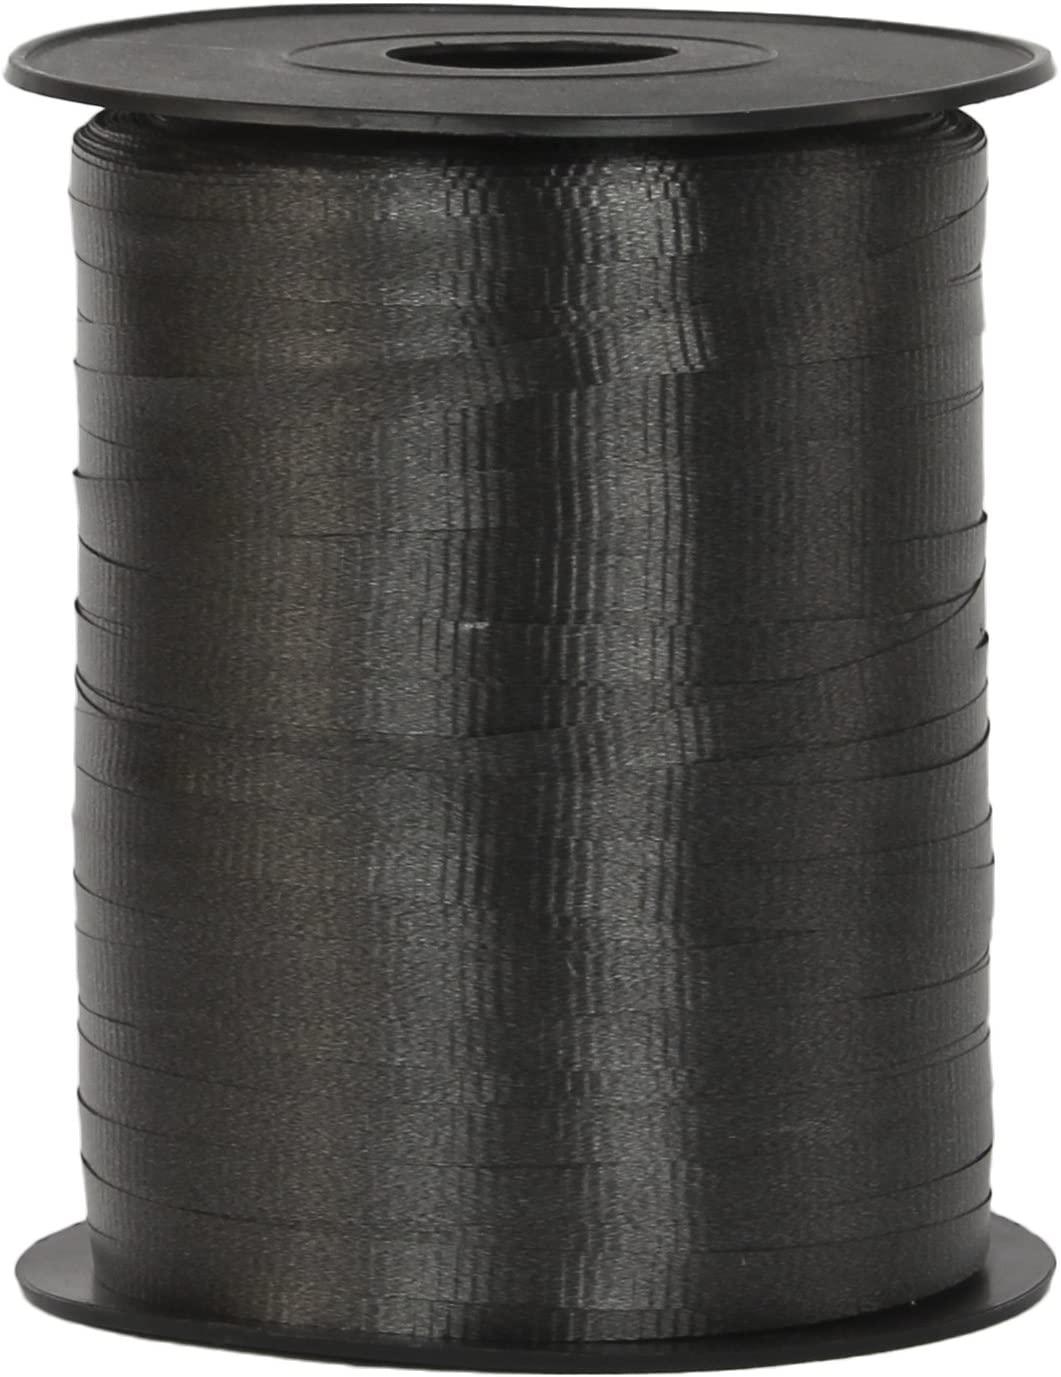 Curling Ribbon 3/16-Inch Wide by 500-Yard - Play Kreative TM (Black)